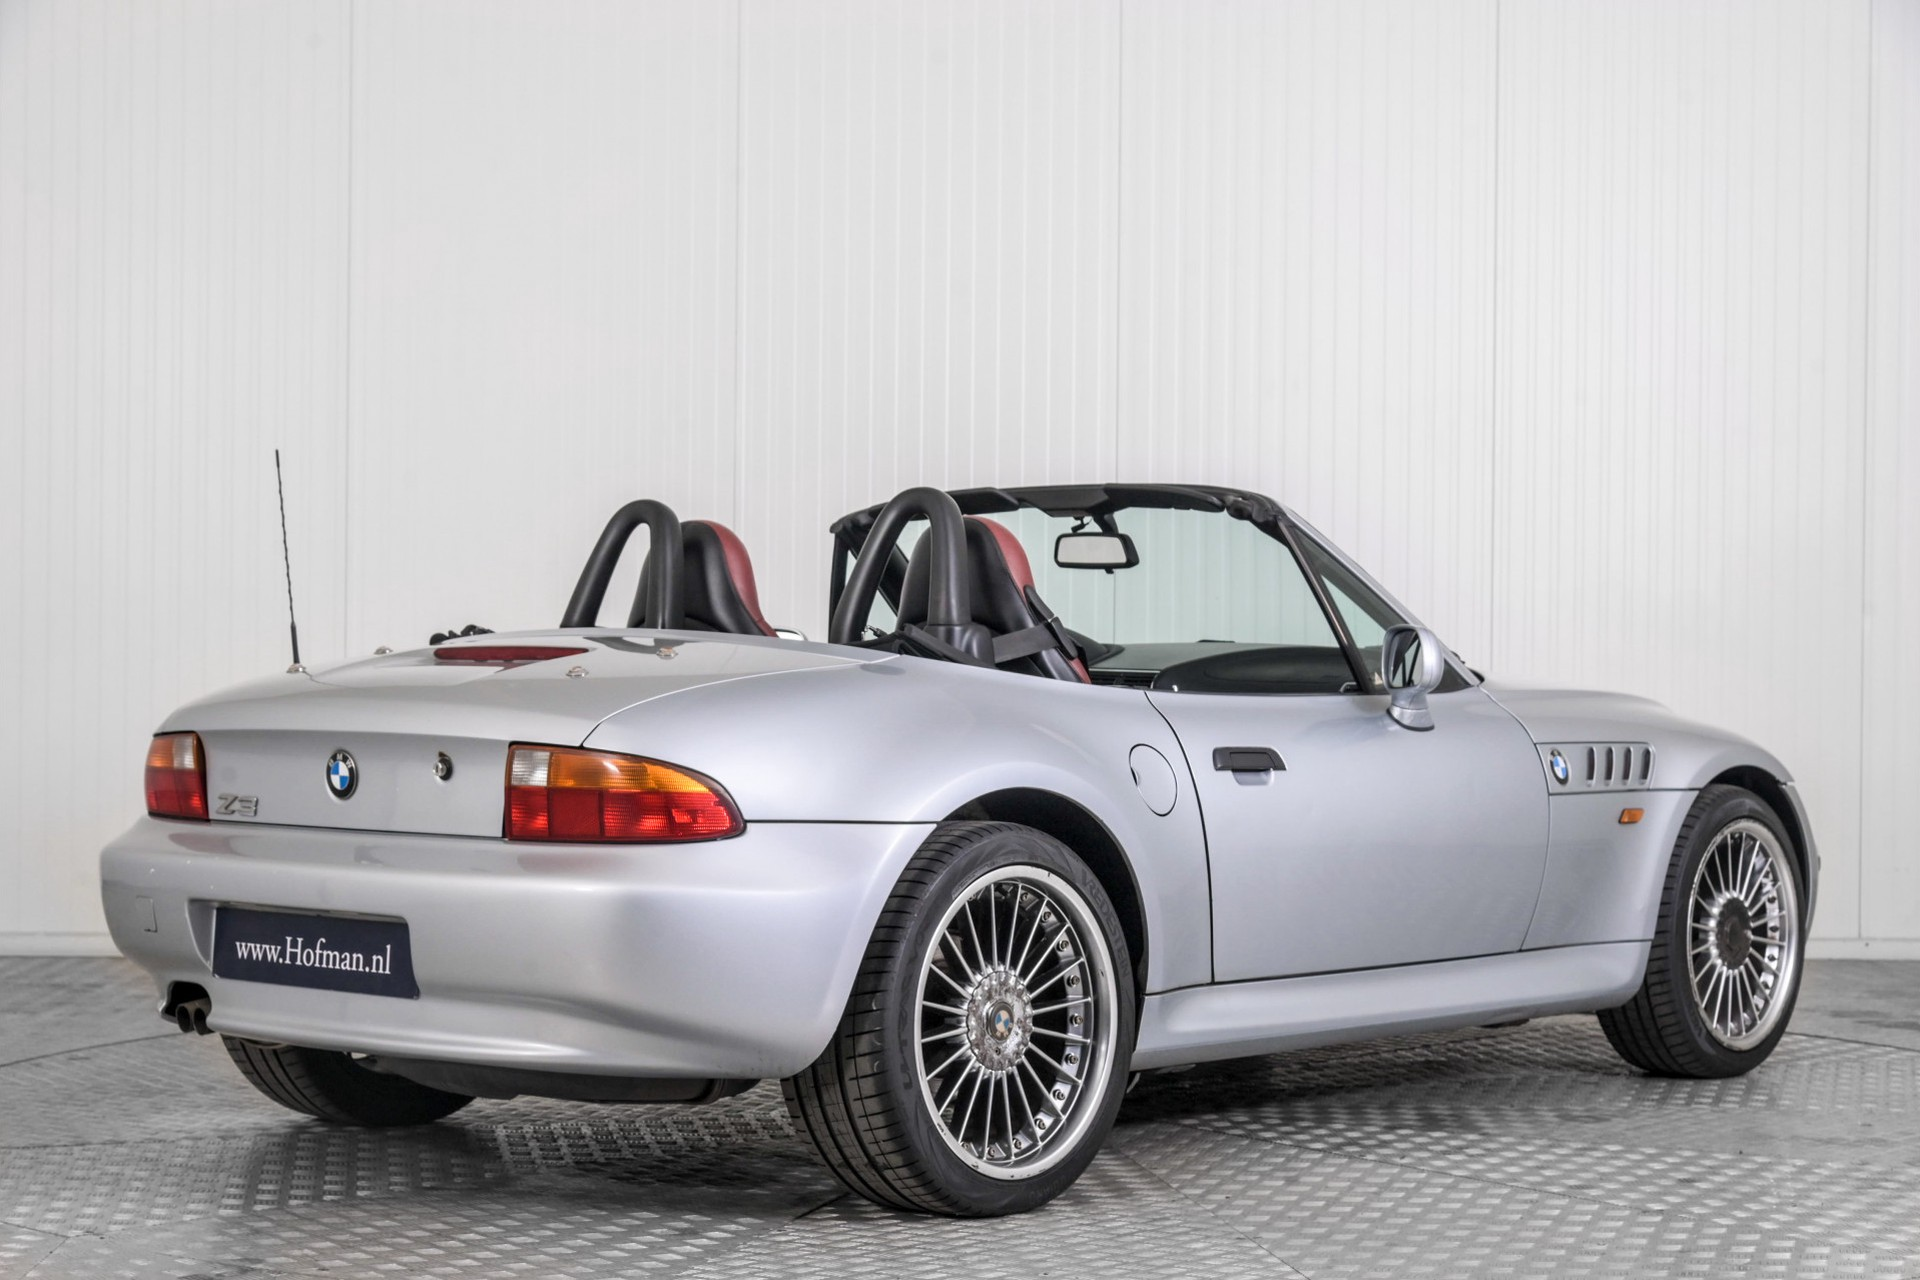 BMW Z3 Roadster 2.8 Foto 2